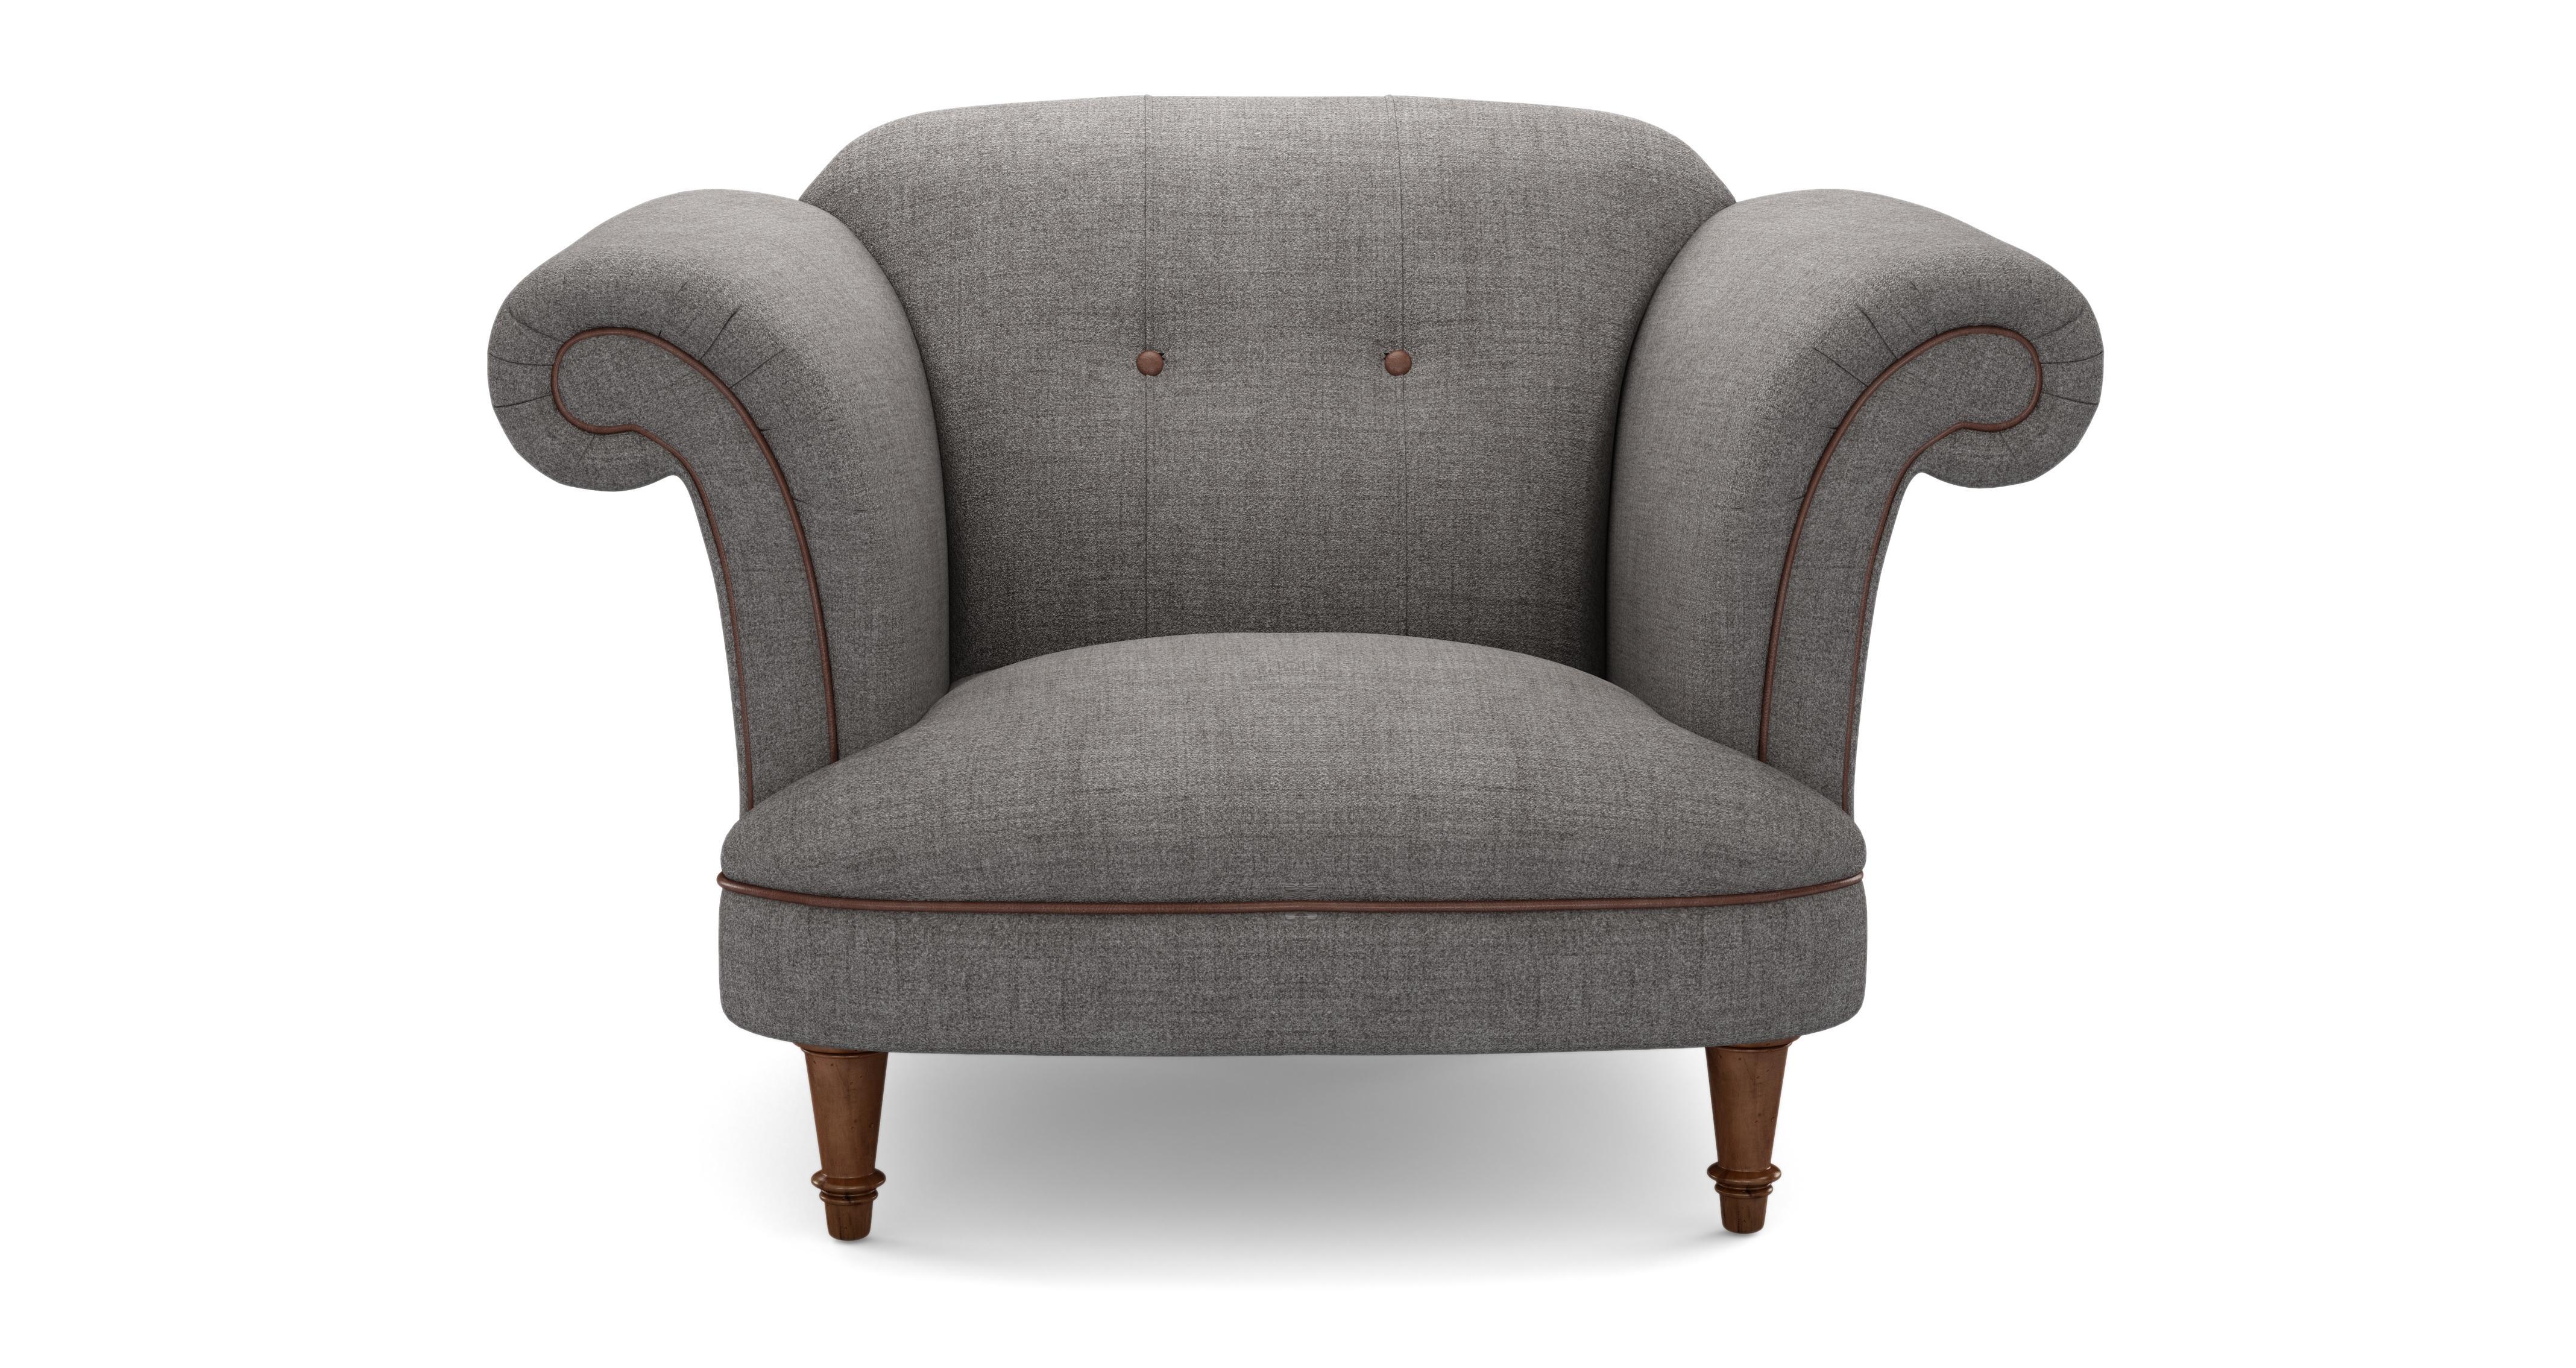 dfs moray sofa reviews sleeper comparison armchair ireland